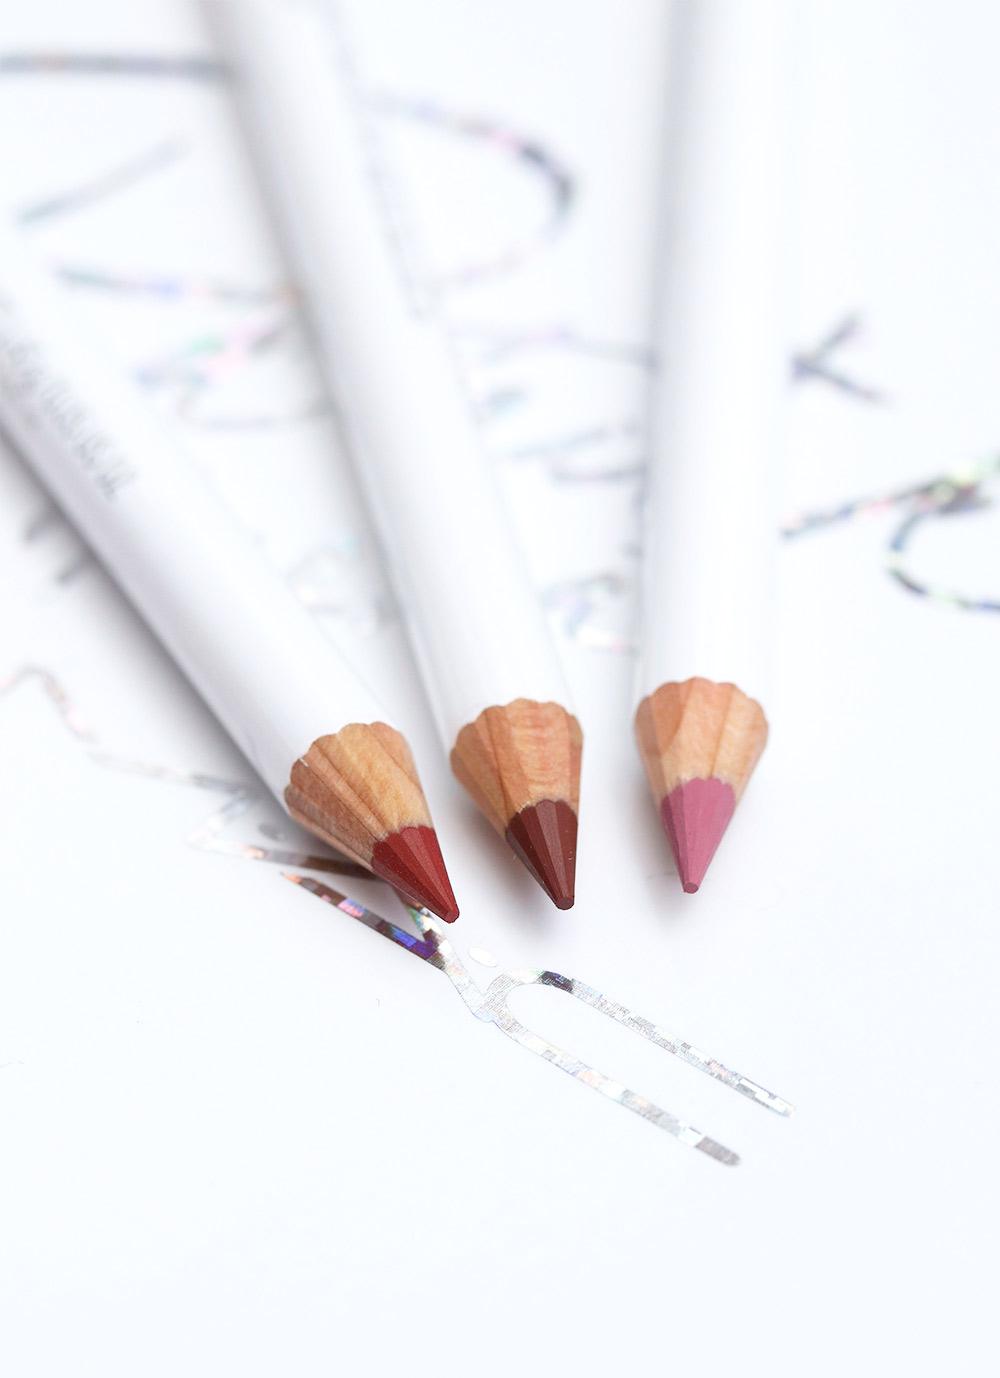 mac patrick starrr lip pencil